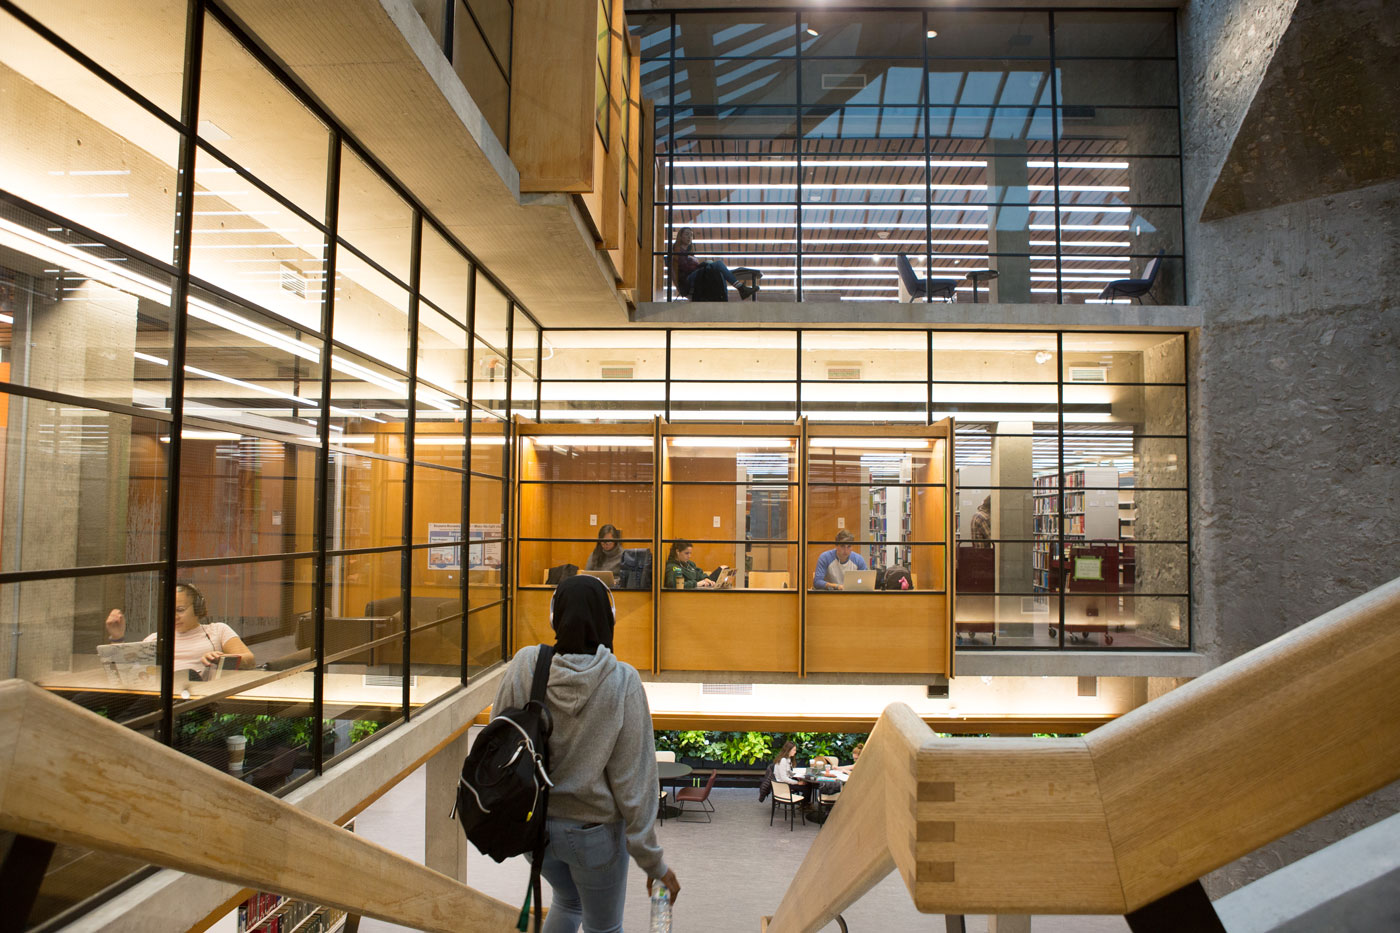 Trent University Bata Library